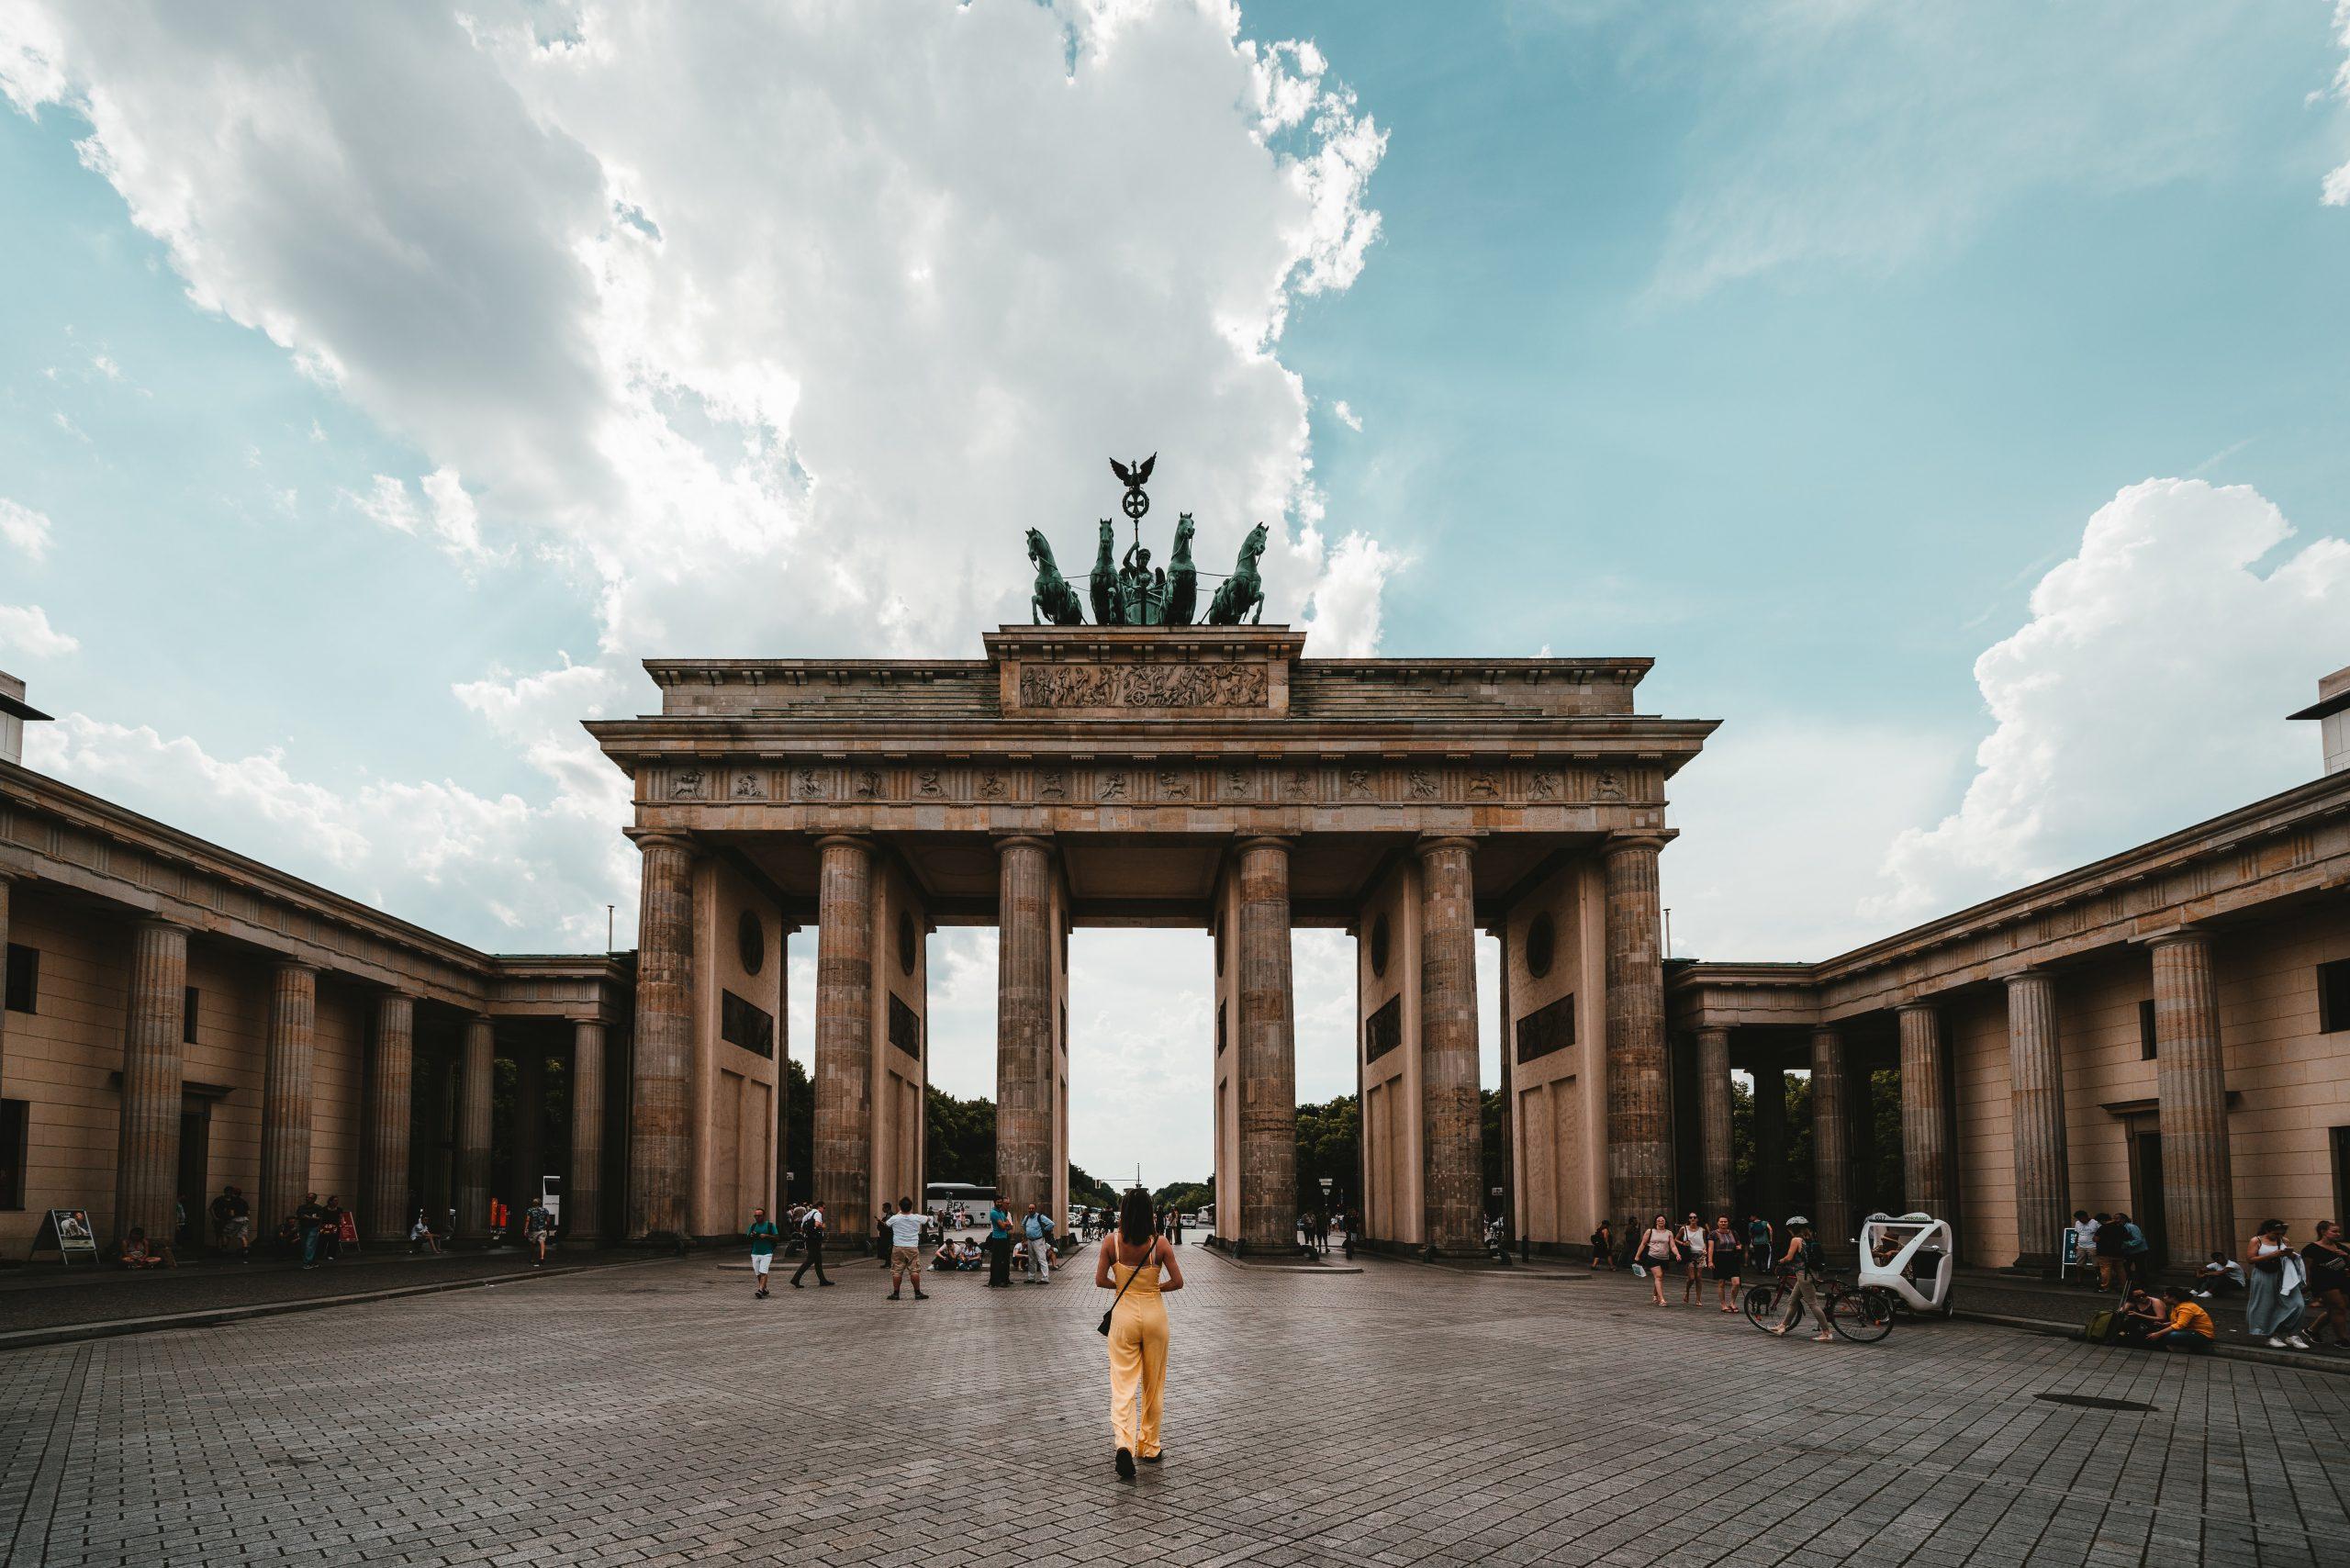 berlin airport to city, berlin airport to city center, berlin schoenefeld airport to city center, schoenefeld airport to berlin, How To Get From Berlin Airport To City Center